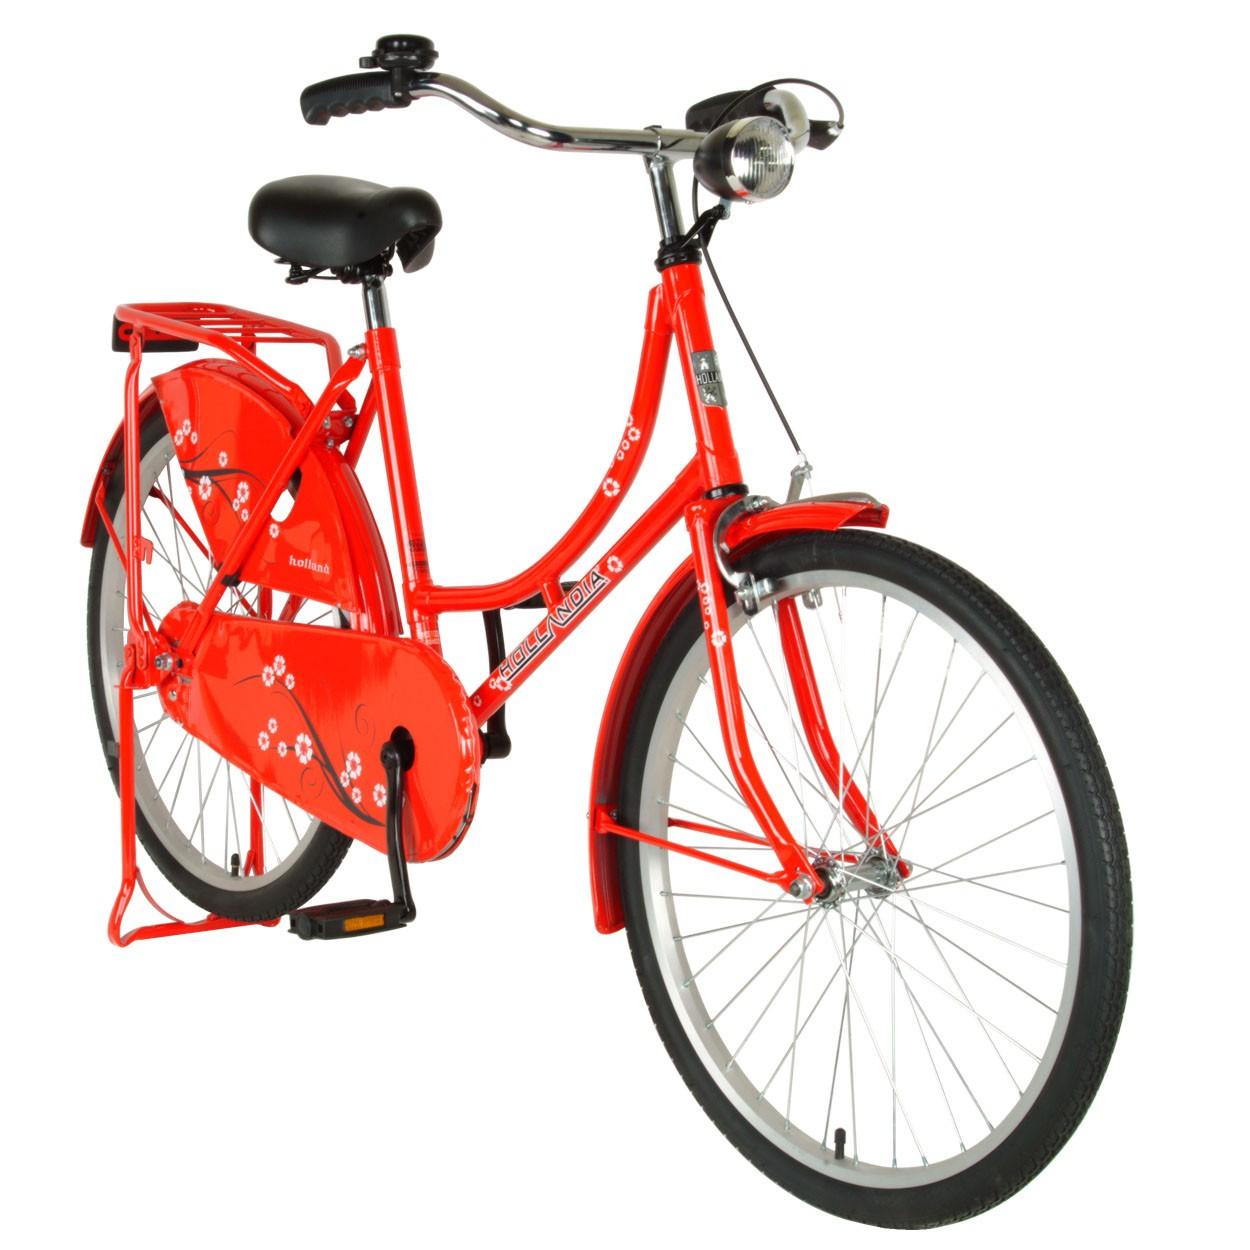 Hollandia New Oma 24 inch Bike